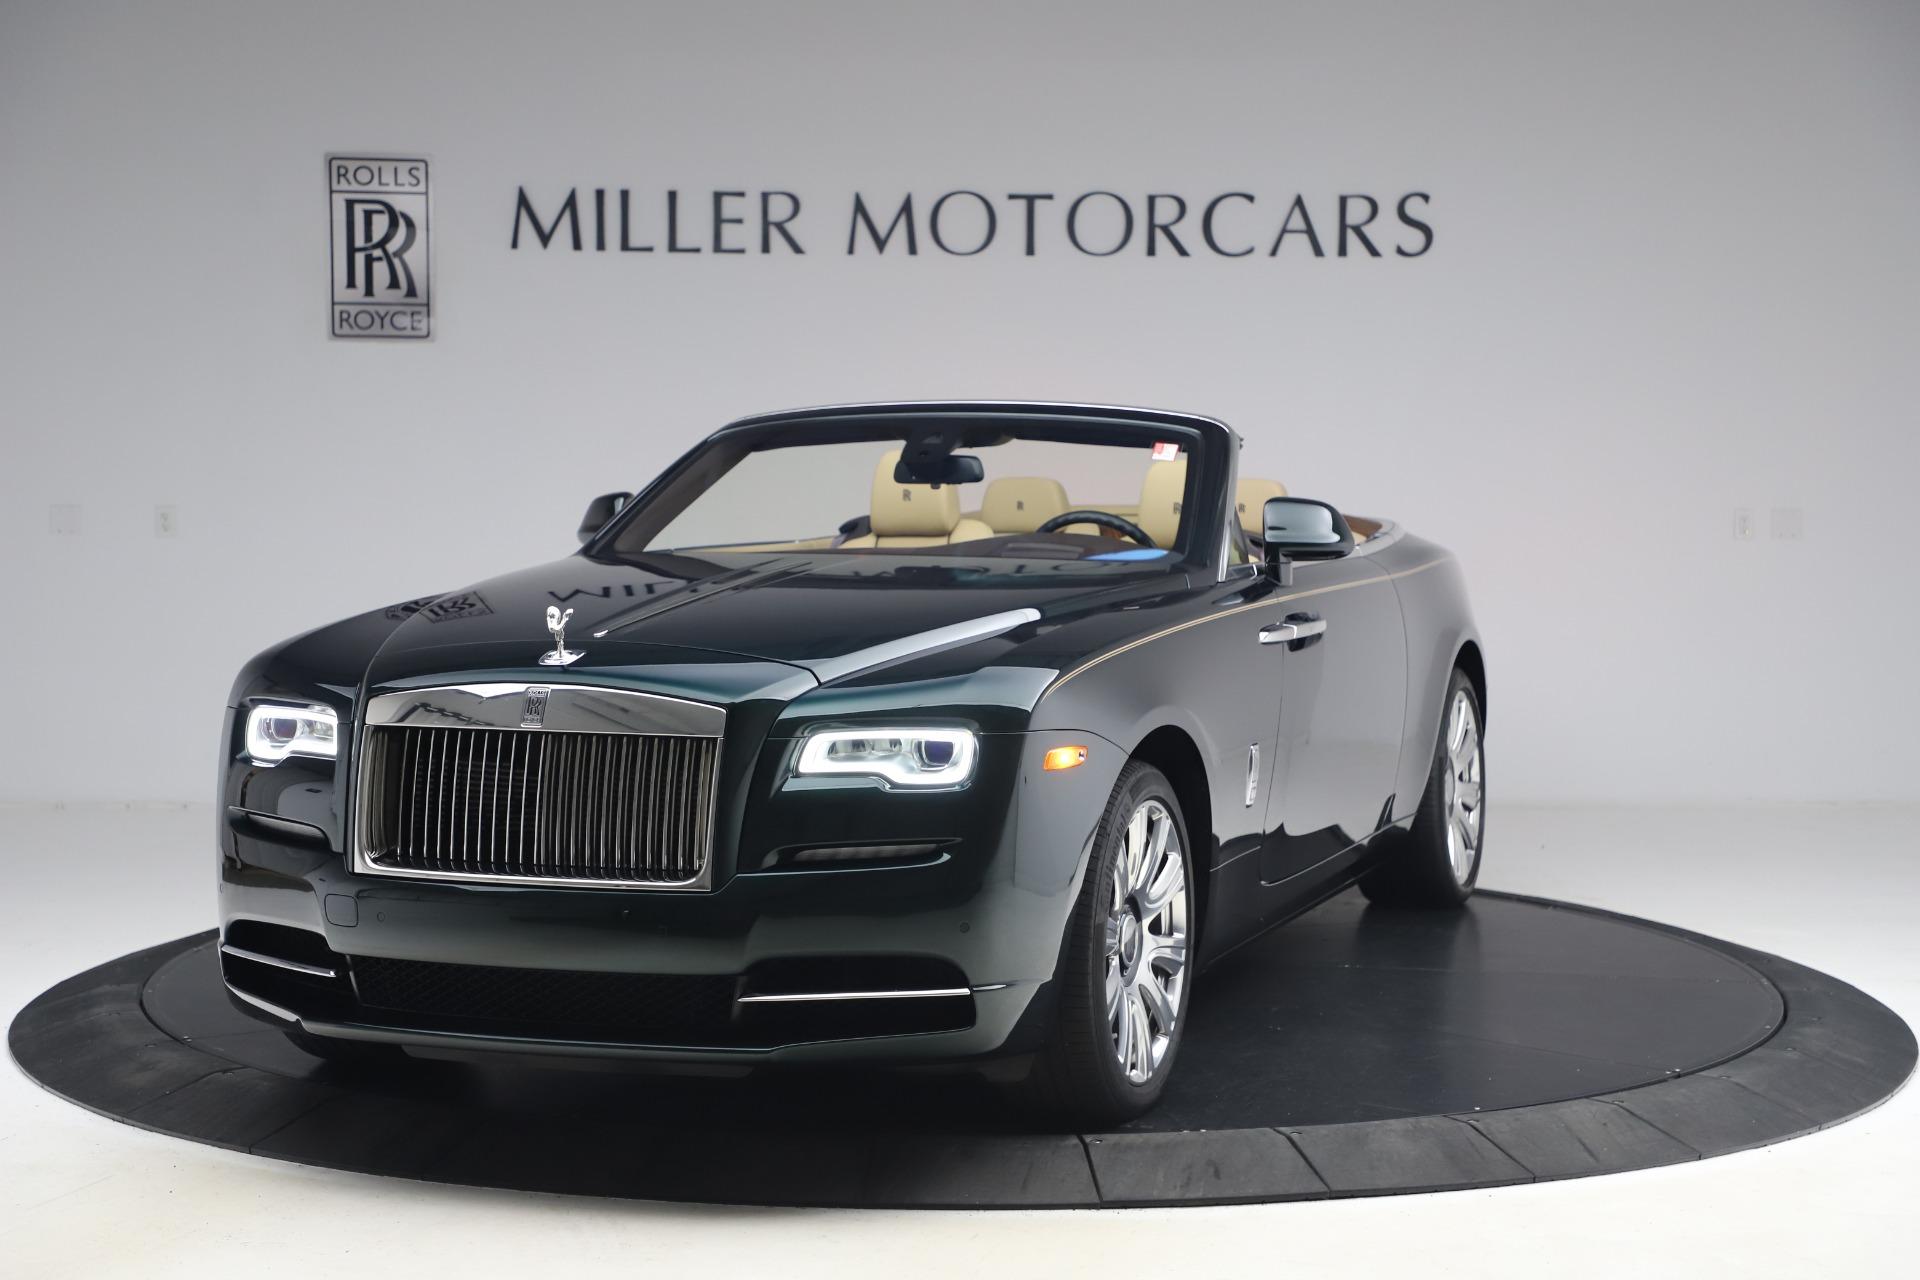 Used 2017 Rolls-Royce Dawn for sale $248,900 at Rolls-Royce Motor Cars Greenwich in Greenwich CT 06830 1